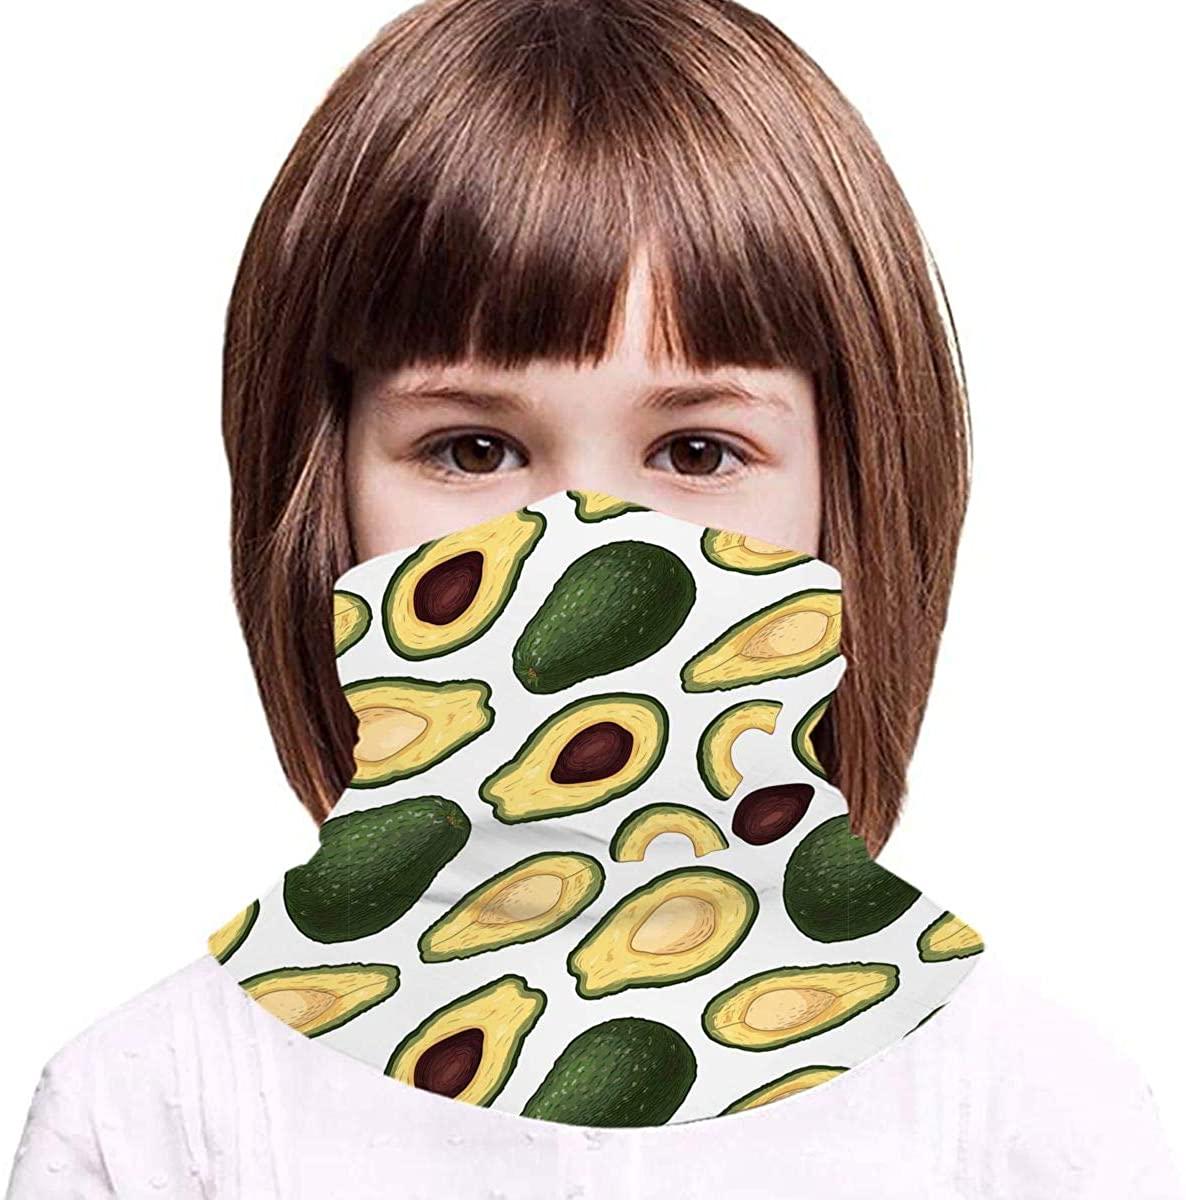 Hand Drawn Colorful Engraved Kids Bandanas Reusable Washable Neck Gaiter Balaclava,Half Face Protective Masks